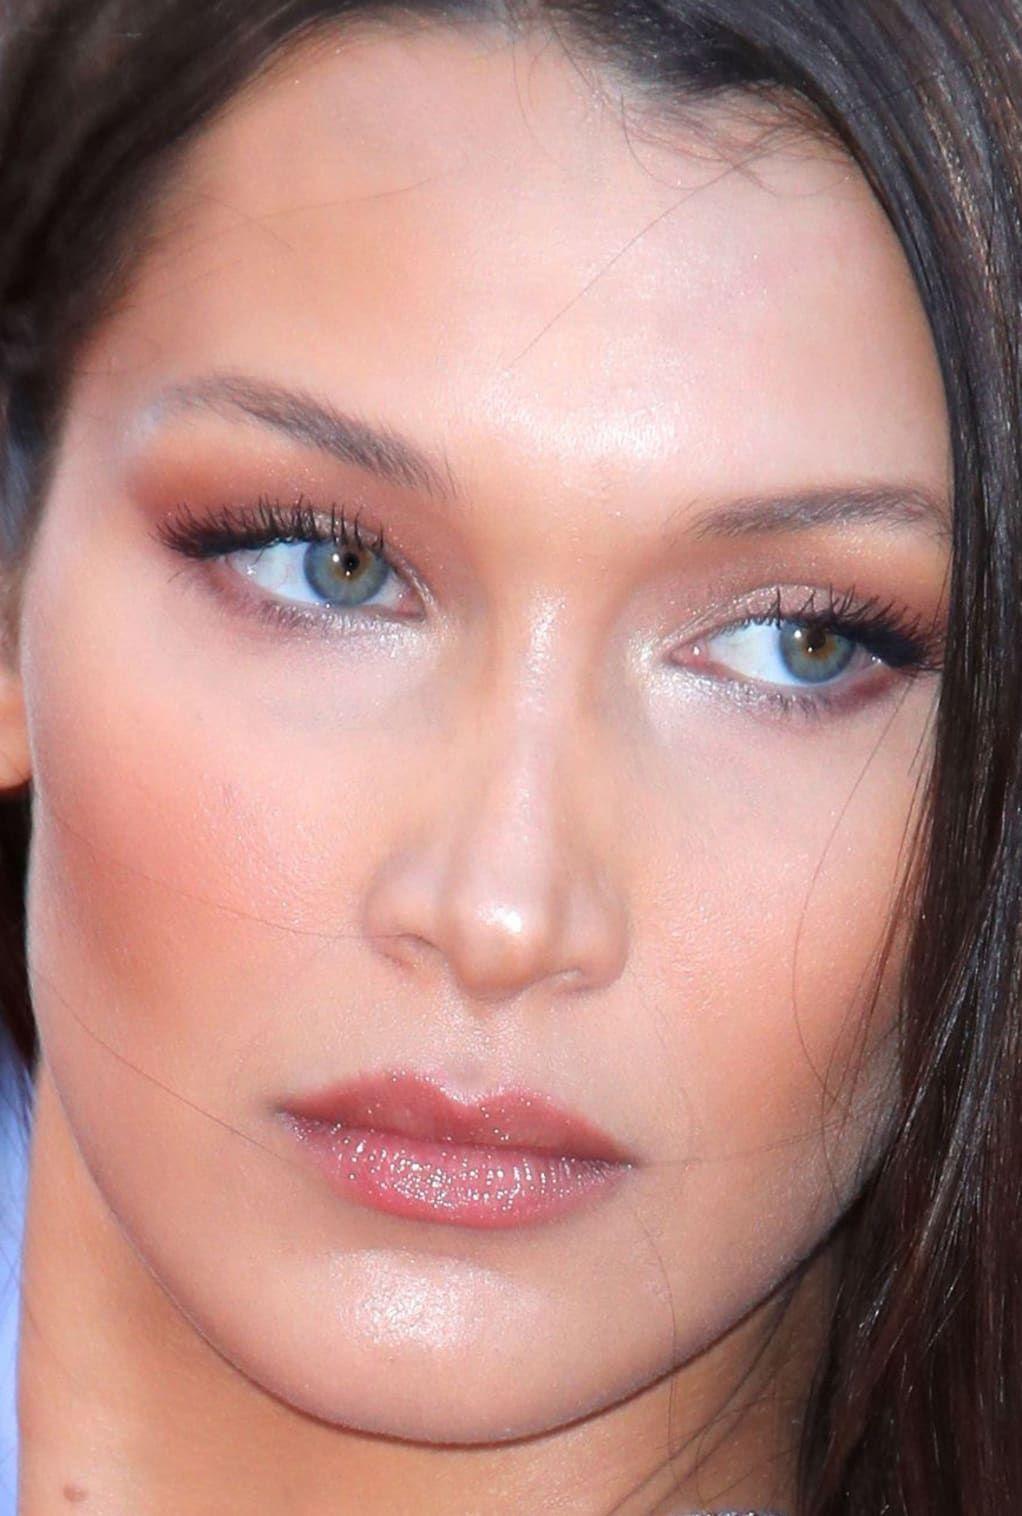 Fox eyebrow [Video] | Fox eyes, Cruelty free beauty, Eyebrows